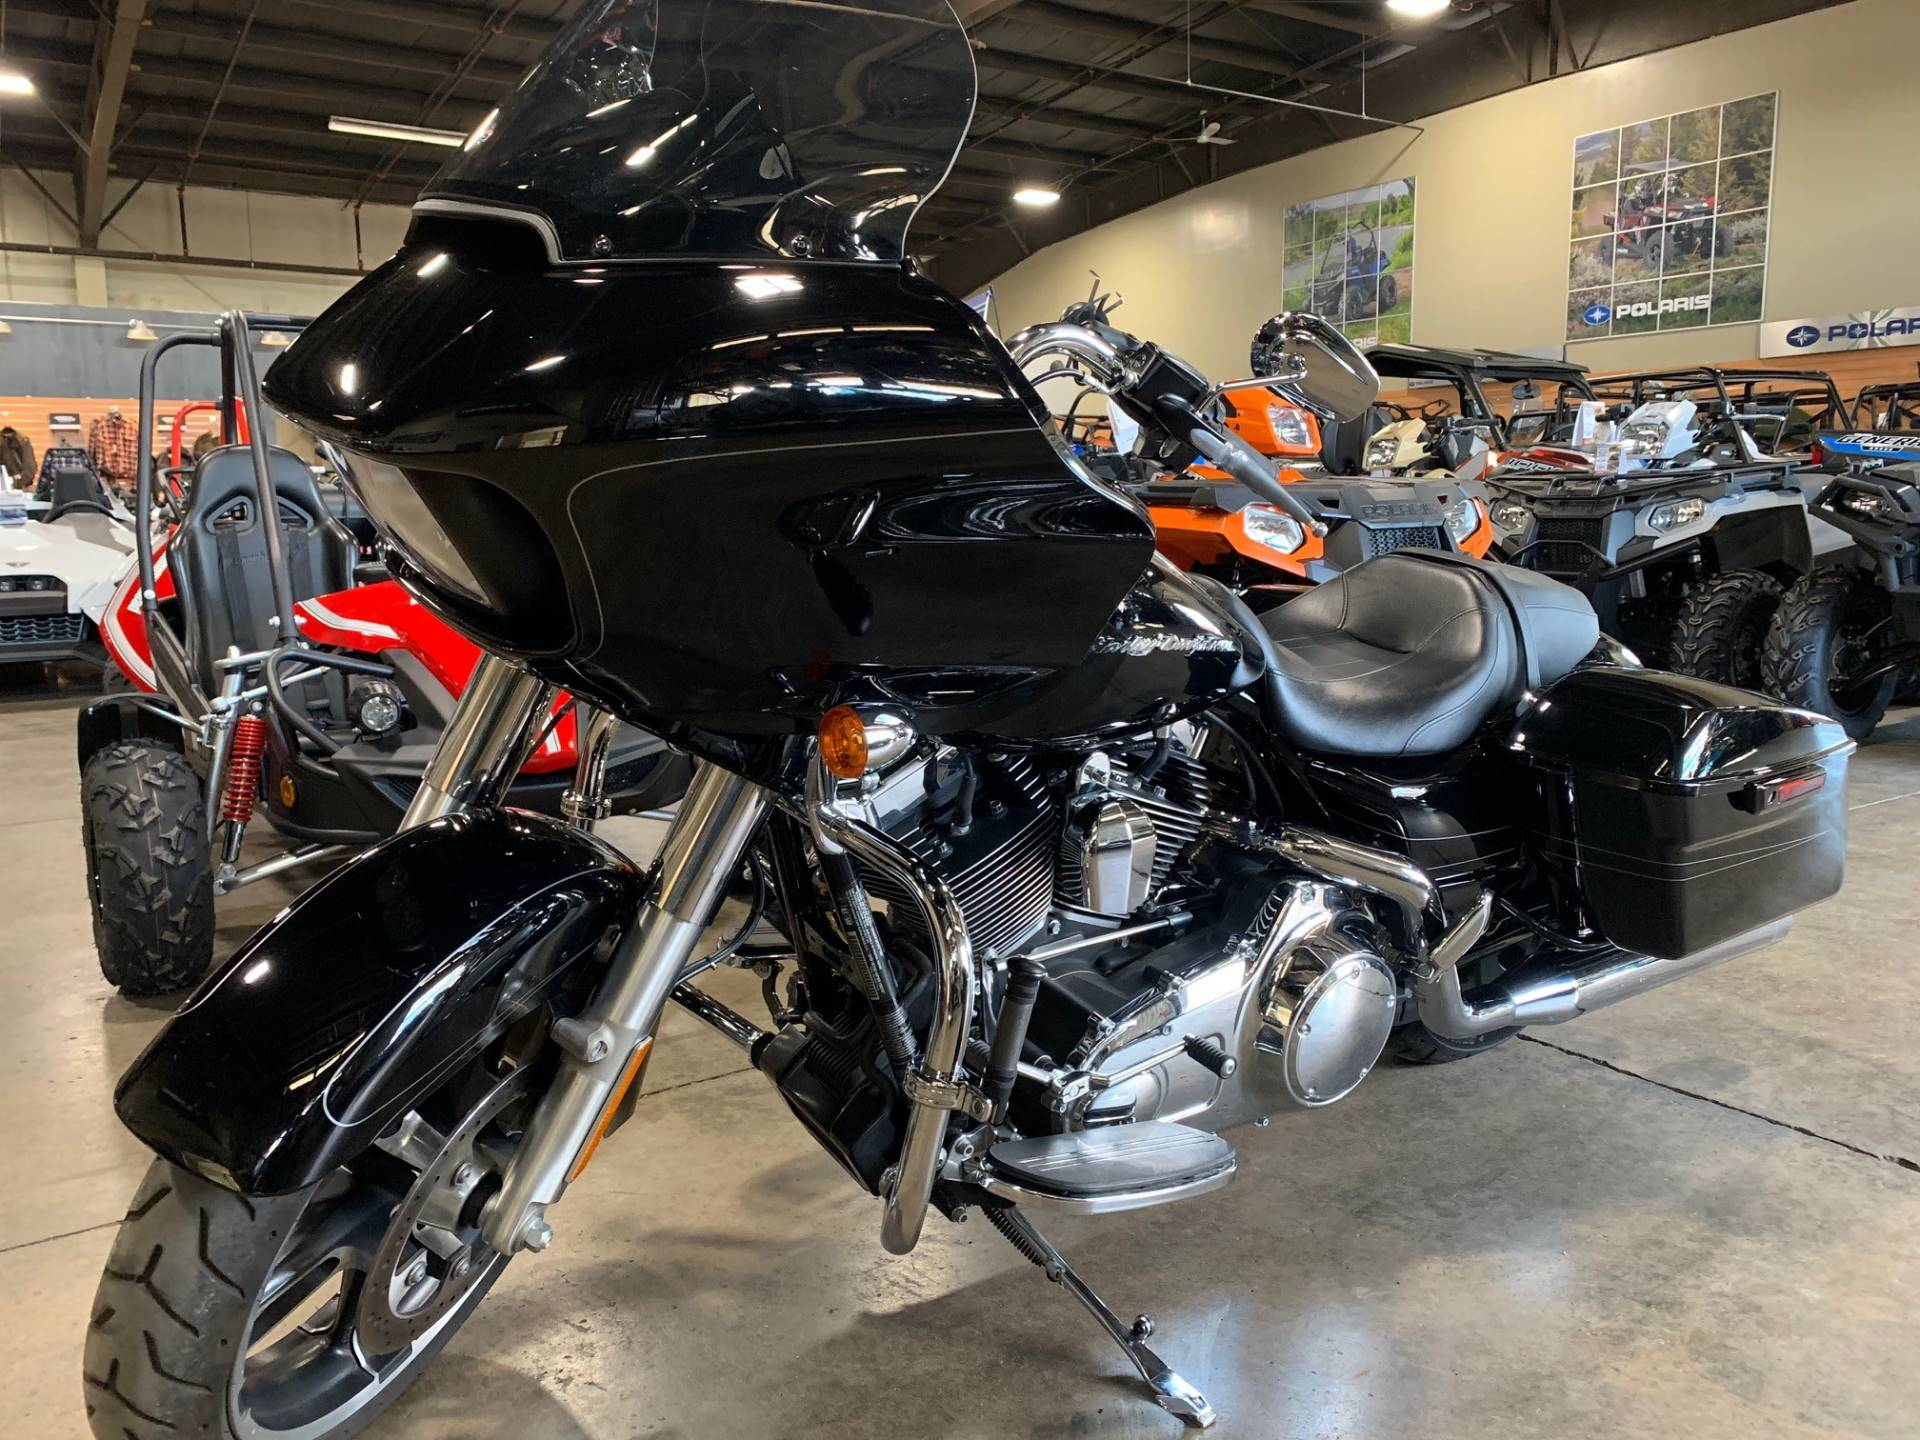 2015 Harley-Davidson ROAD GLIDE SPECIAL 11